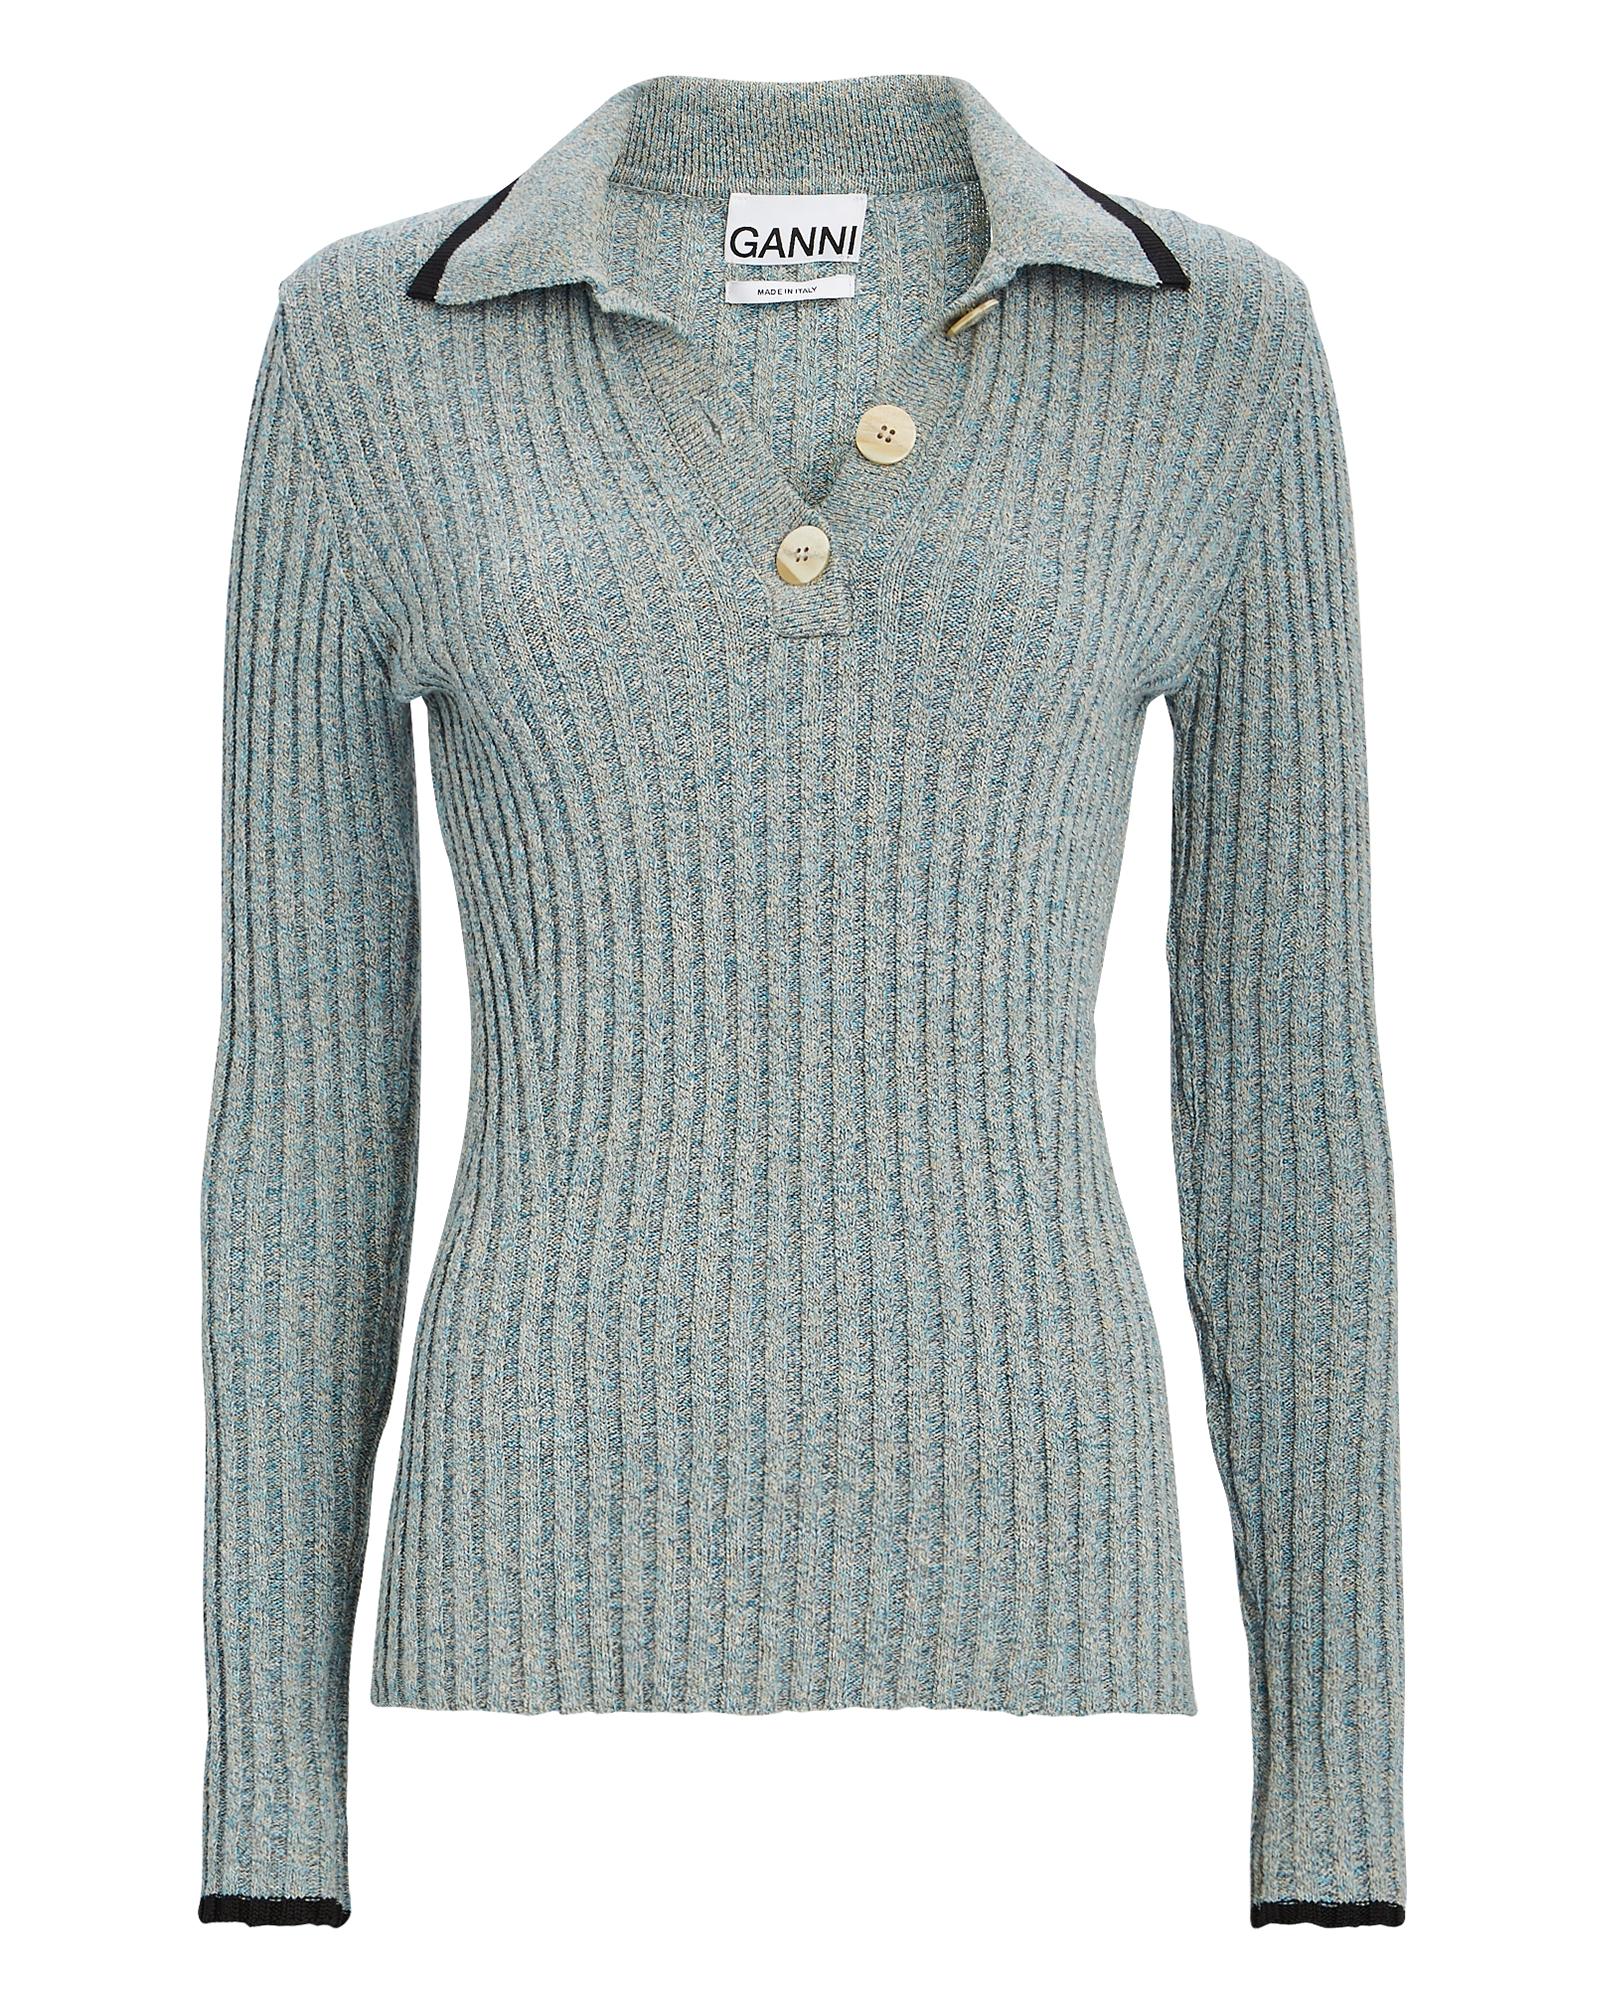 Ganni Linens Rib Knit Polo Sweater